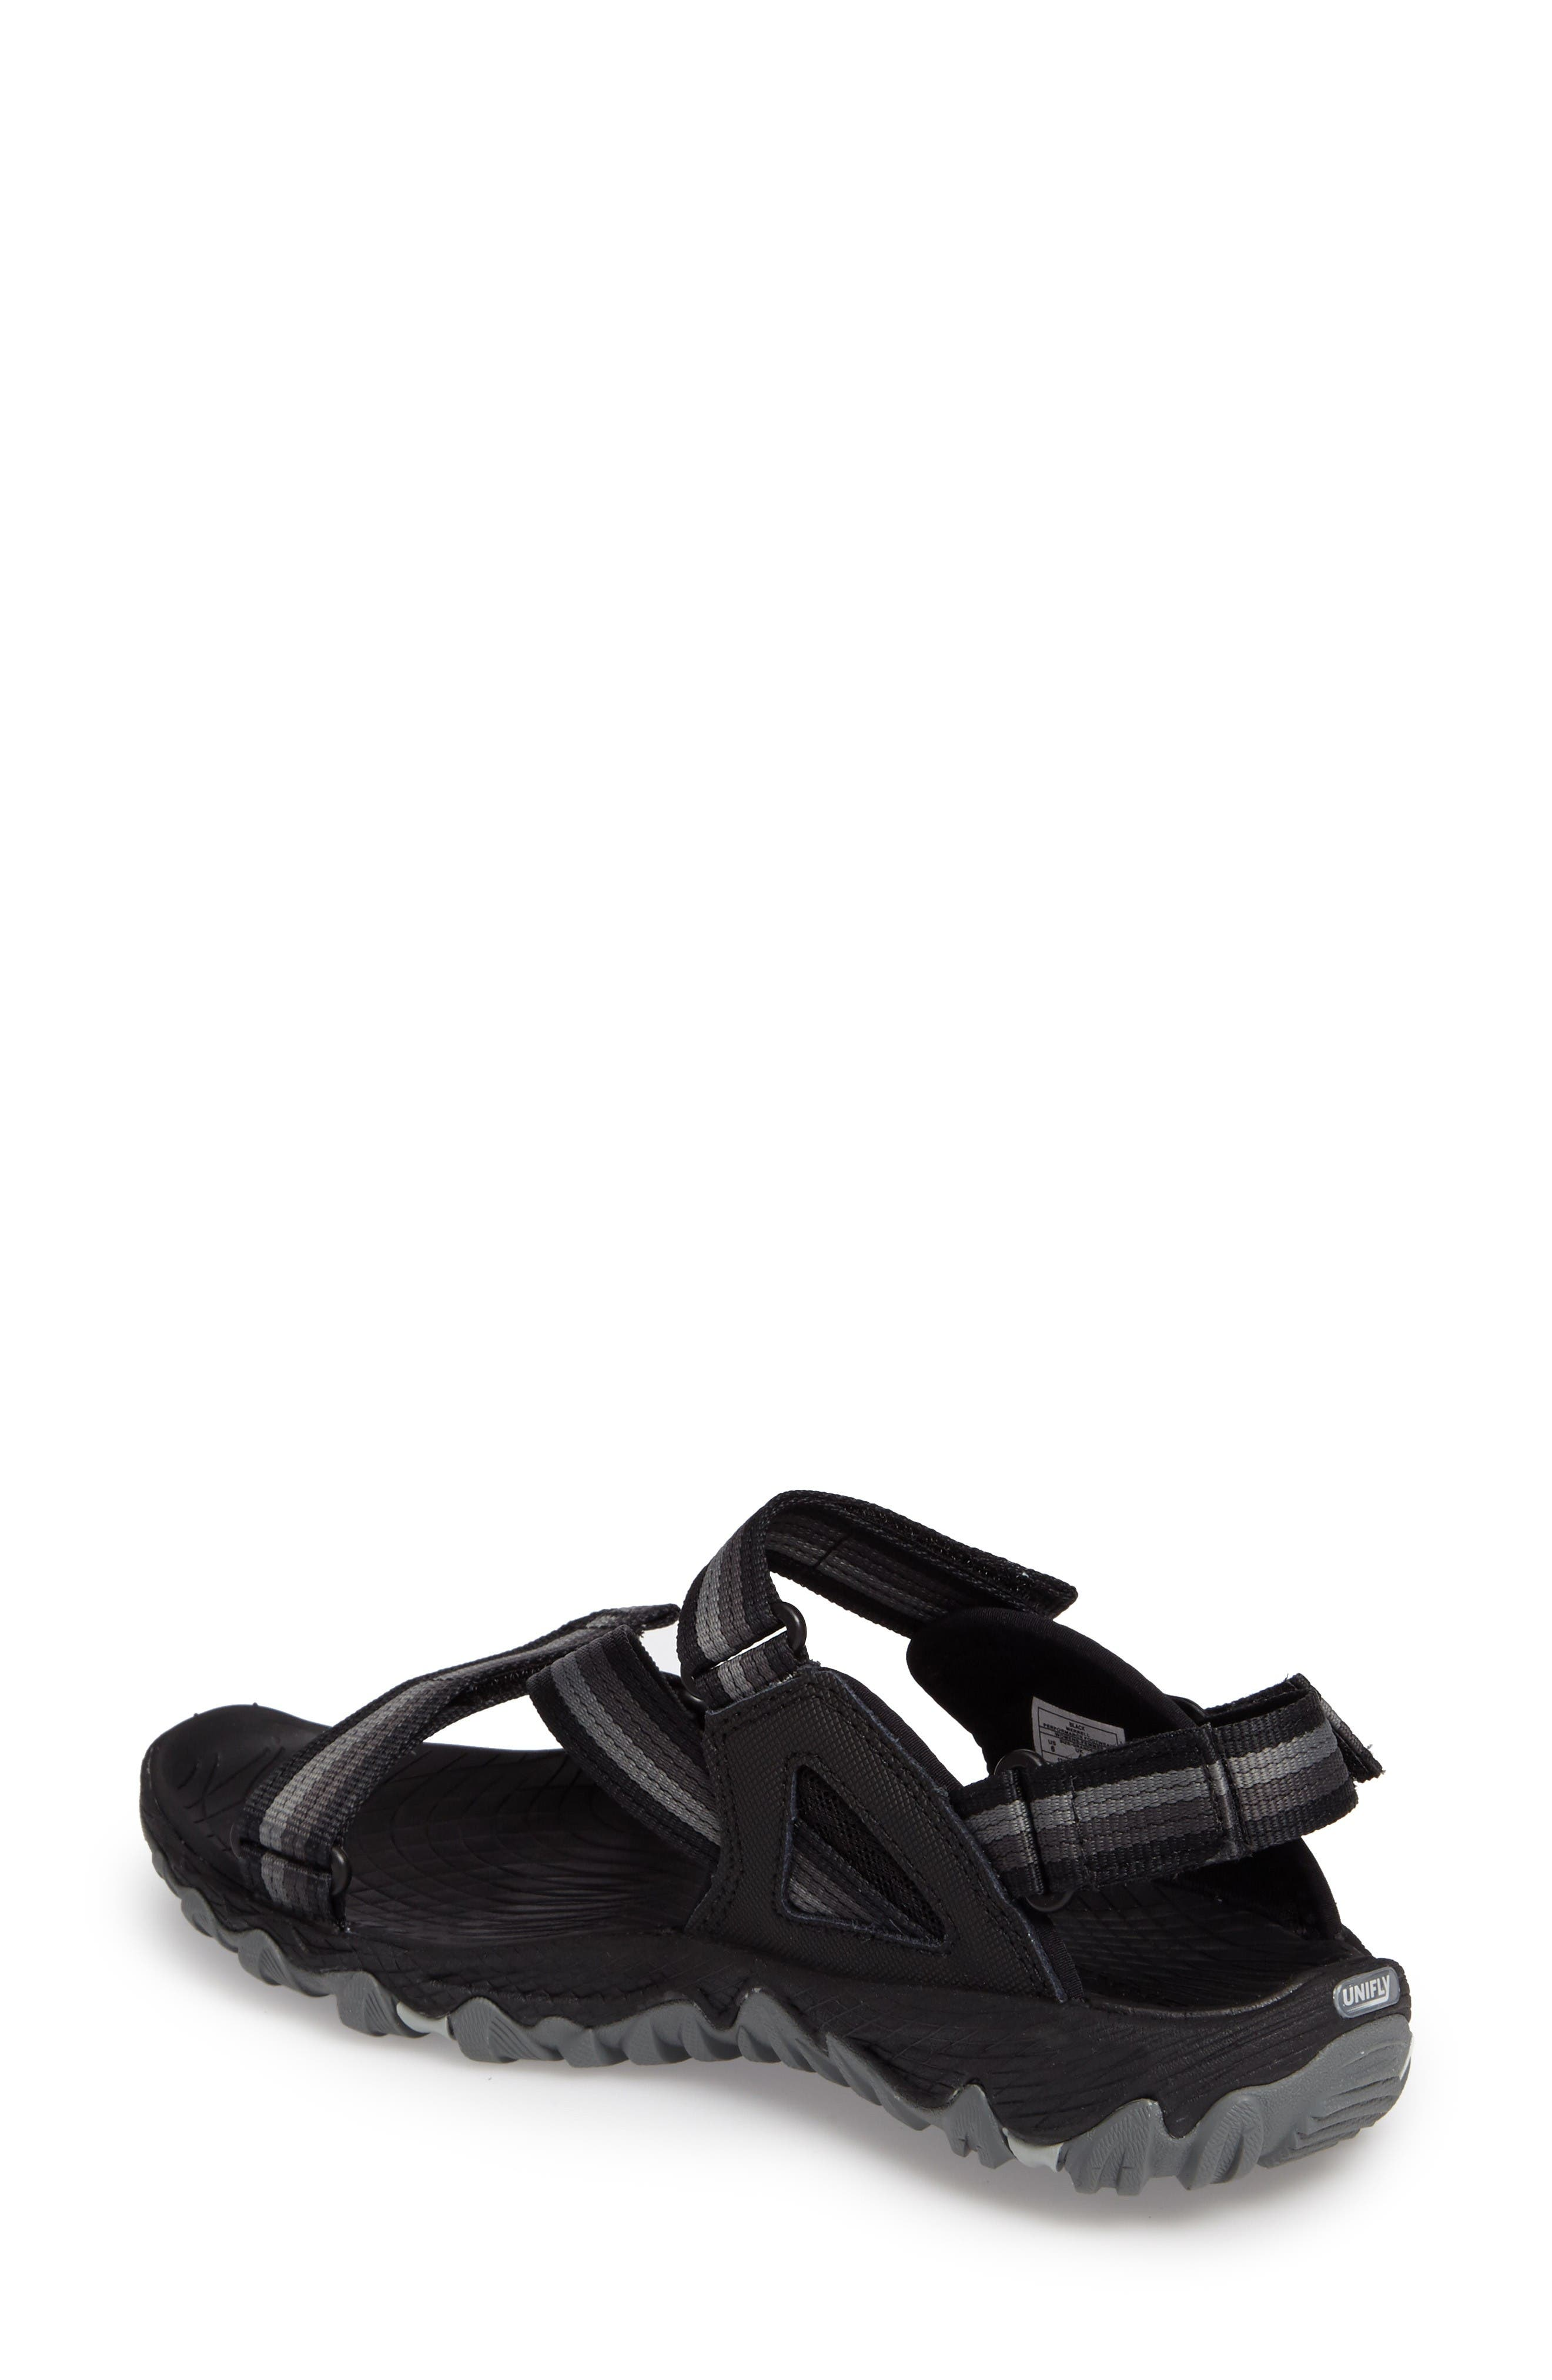 All Out Blaze Sport Sandal,                             Alternate thumbnail 2, color,                             Black Fabric